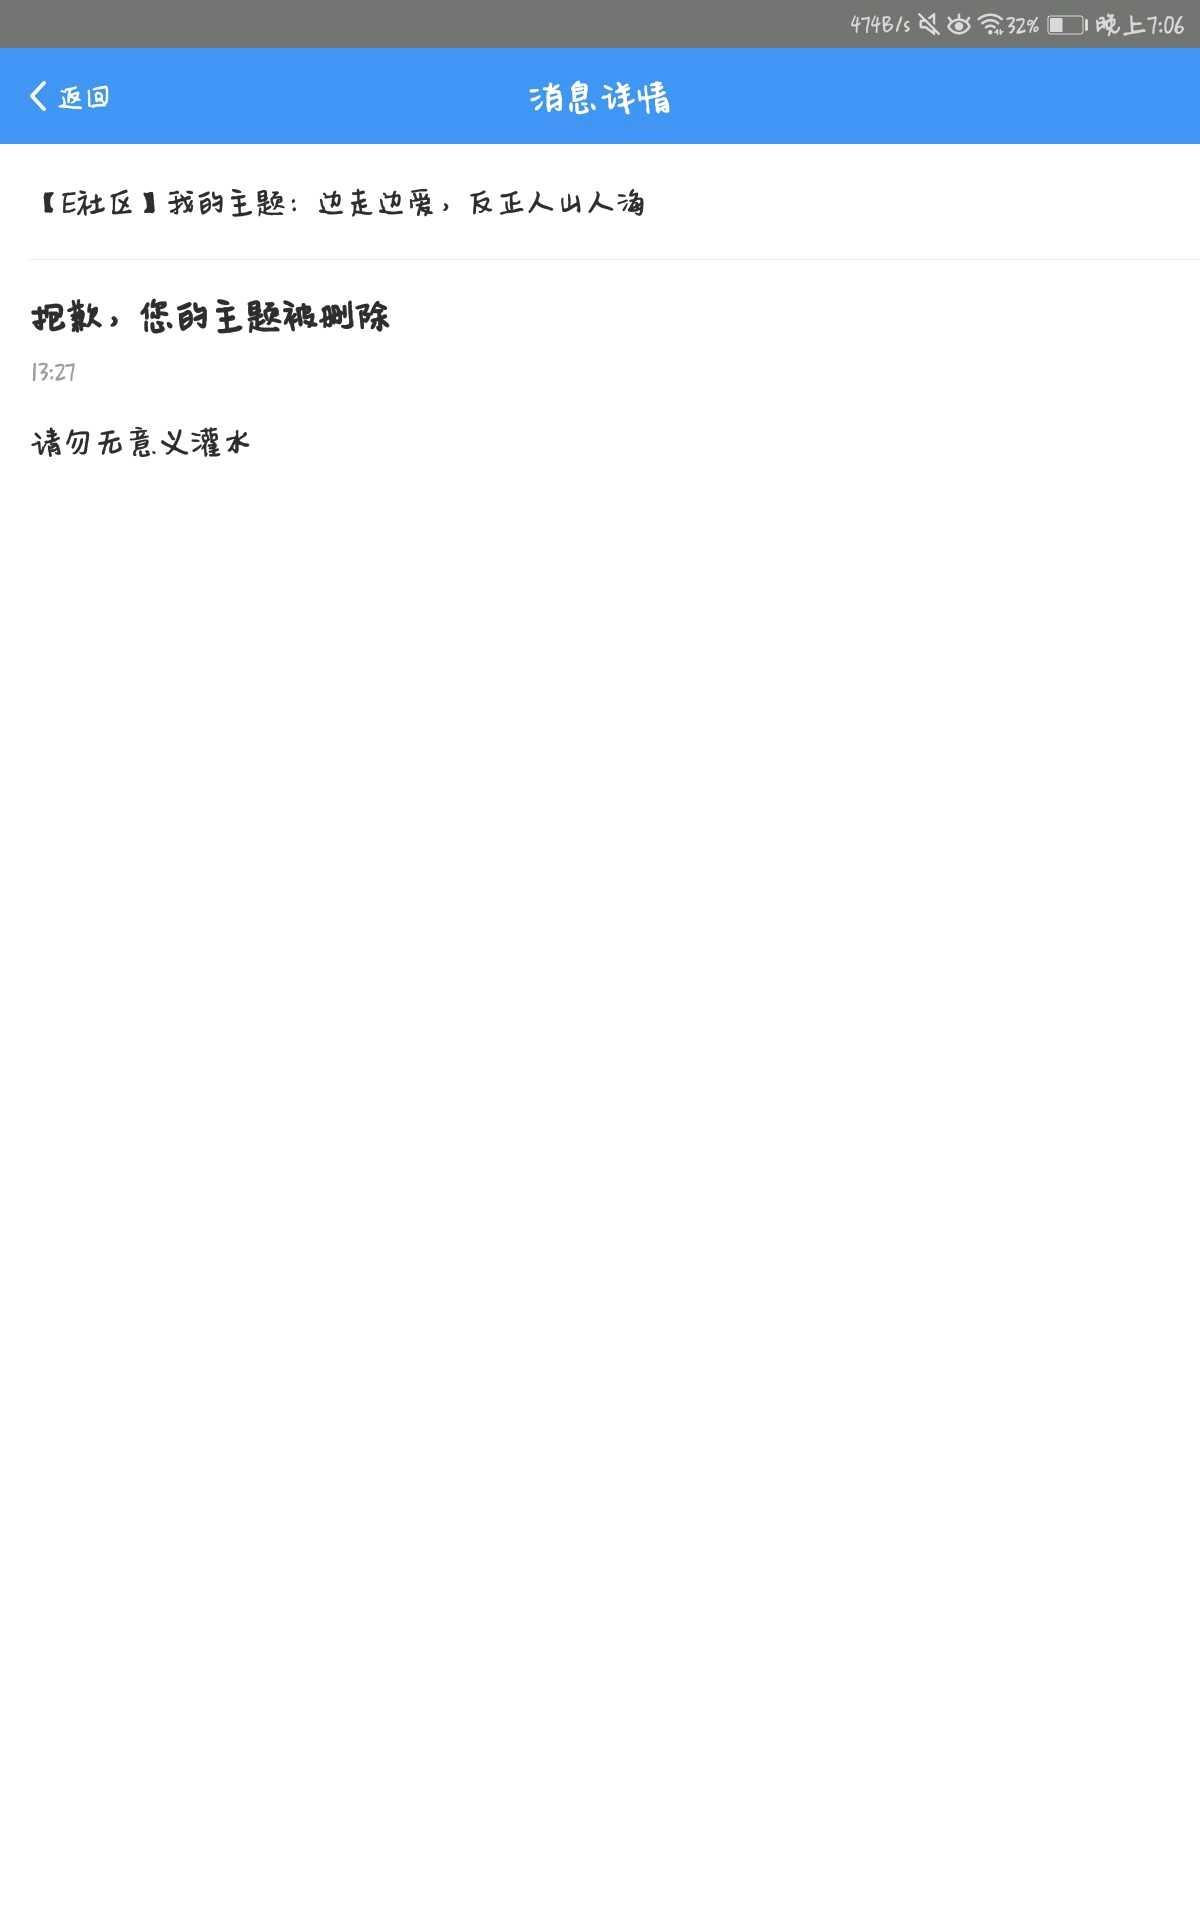 Screenshot_20180109-190607.png